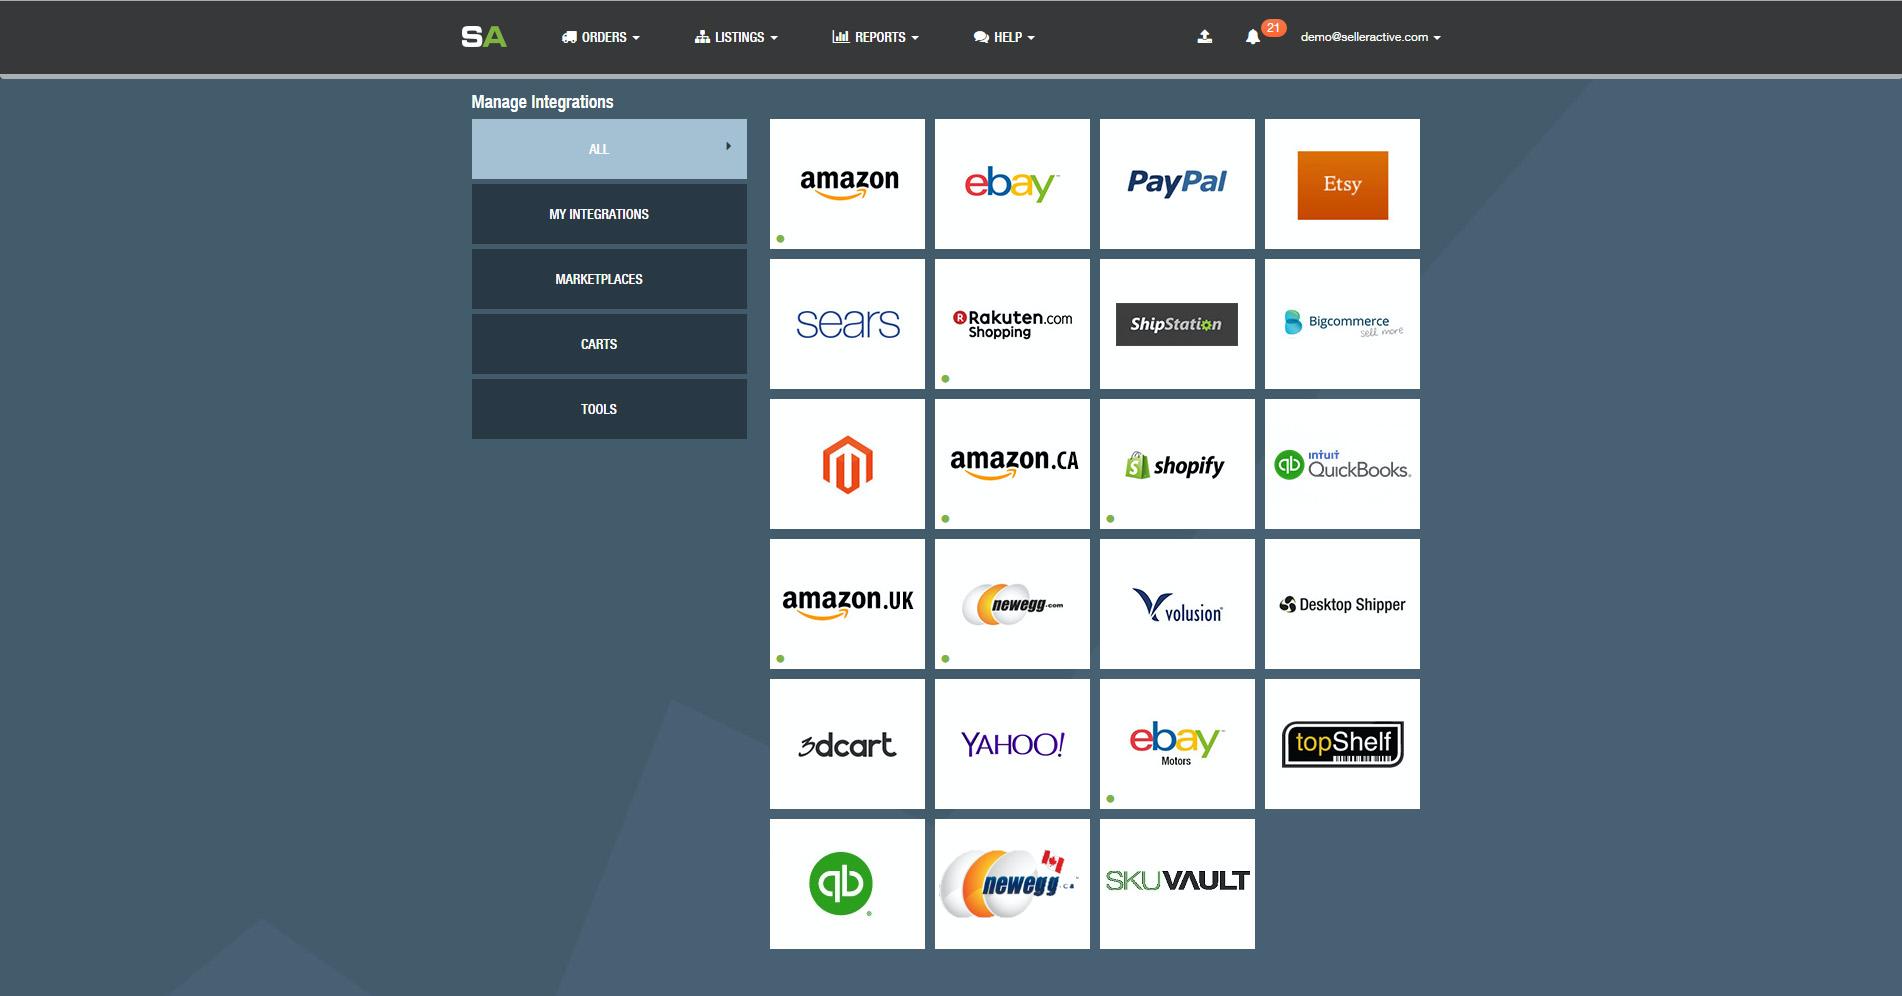 SellerActive screenshot: Integrations Page